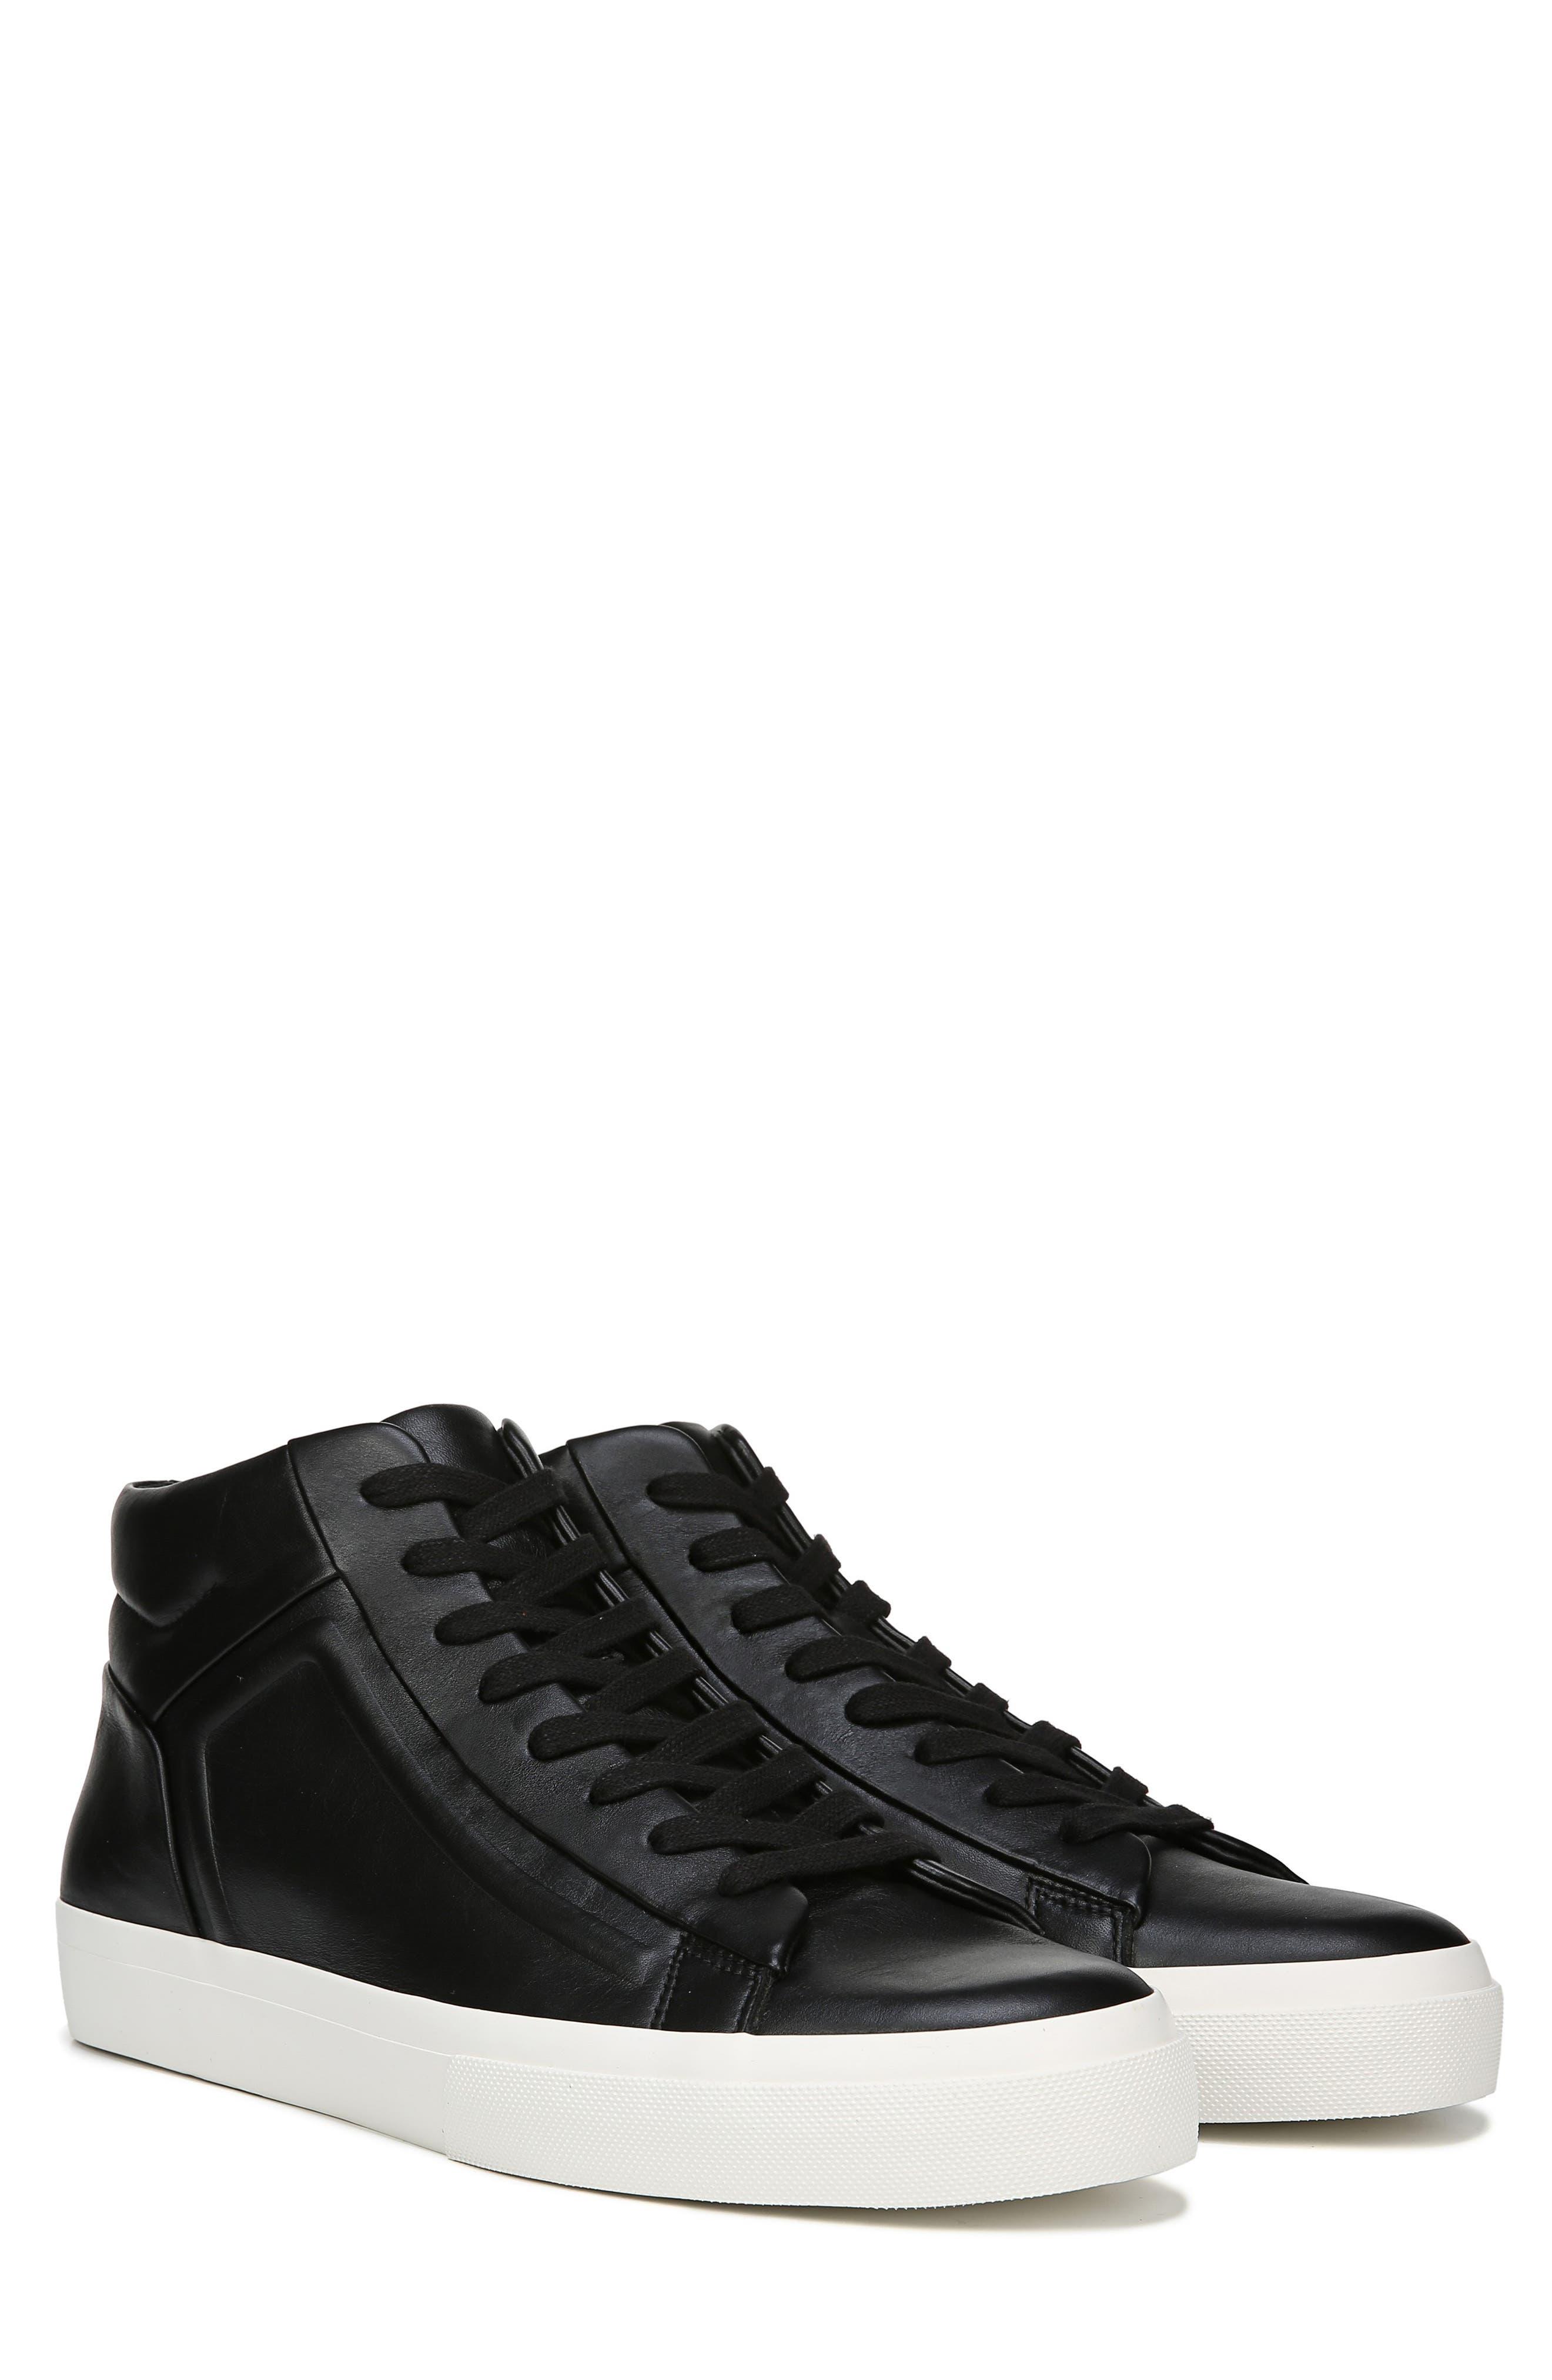 VINCE, Fynn High Top Sneaker, Alternate thumbnail 8, color, BLACK